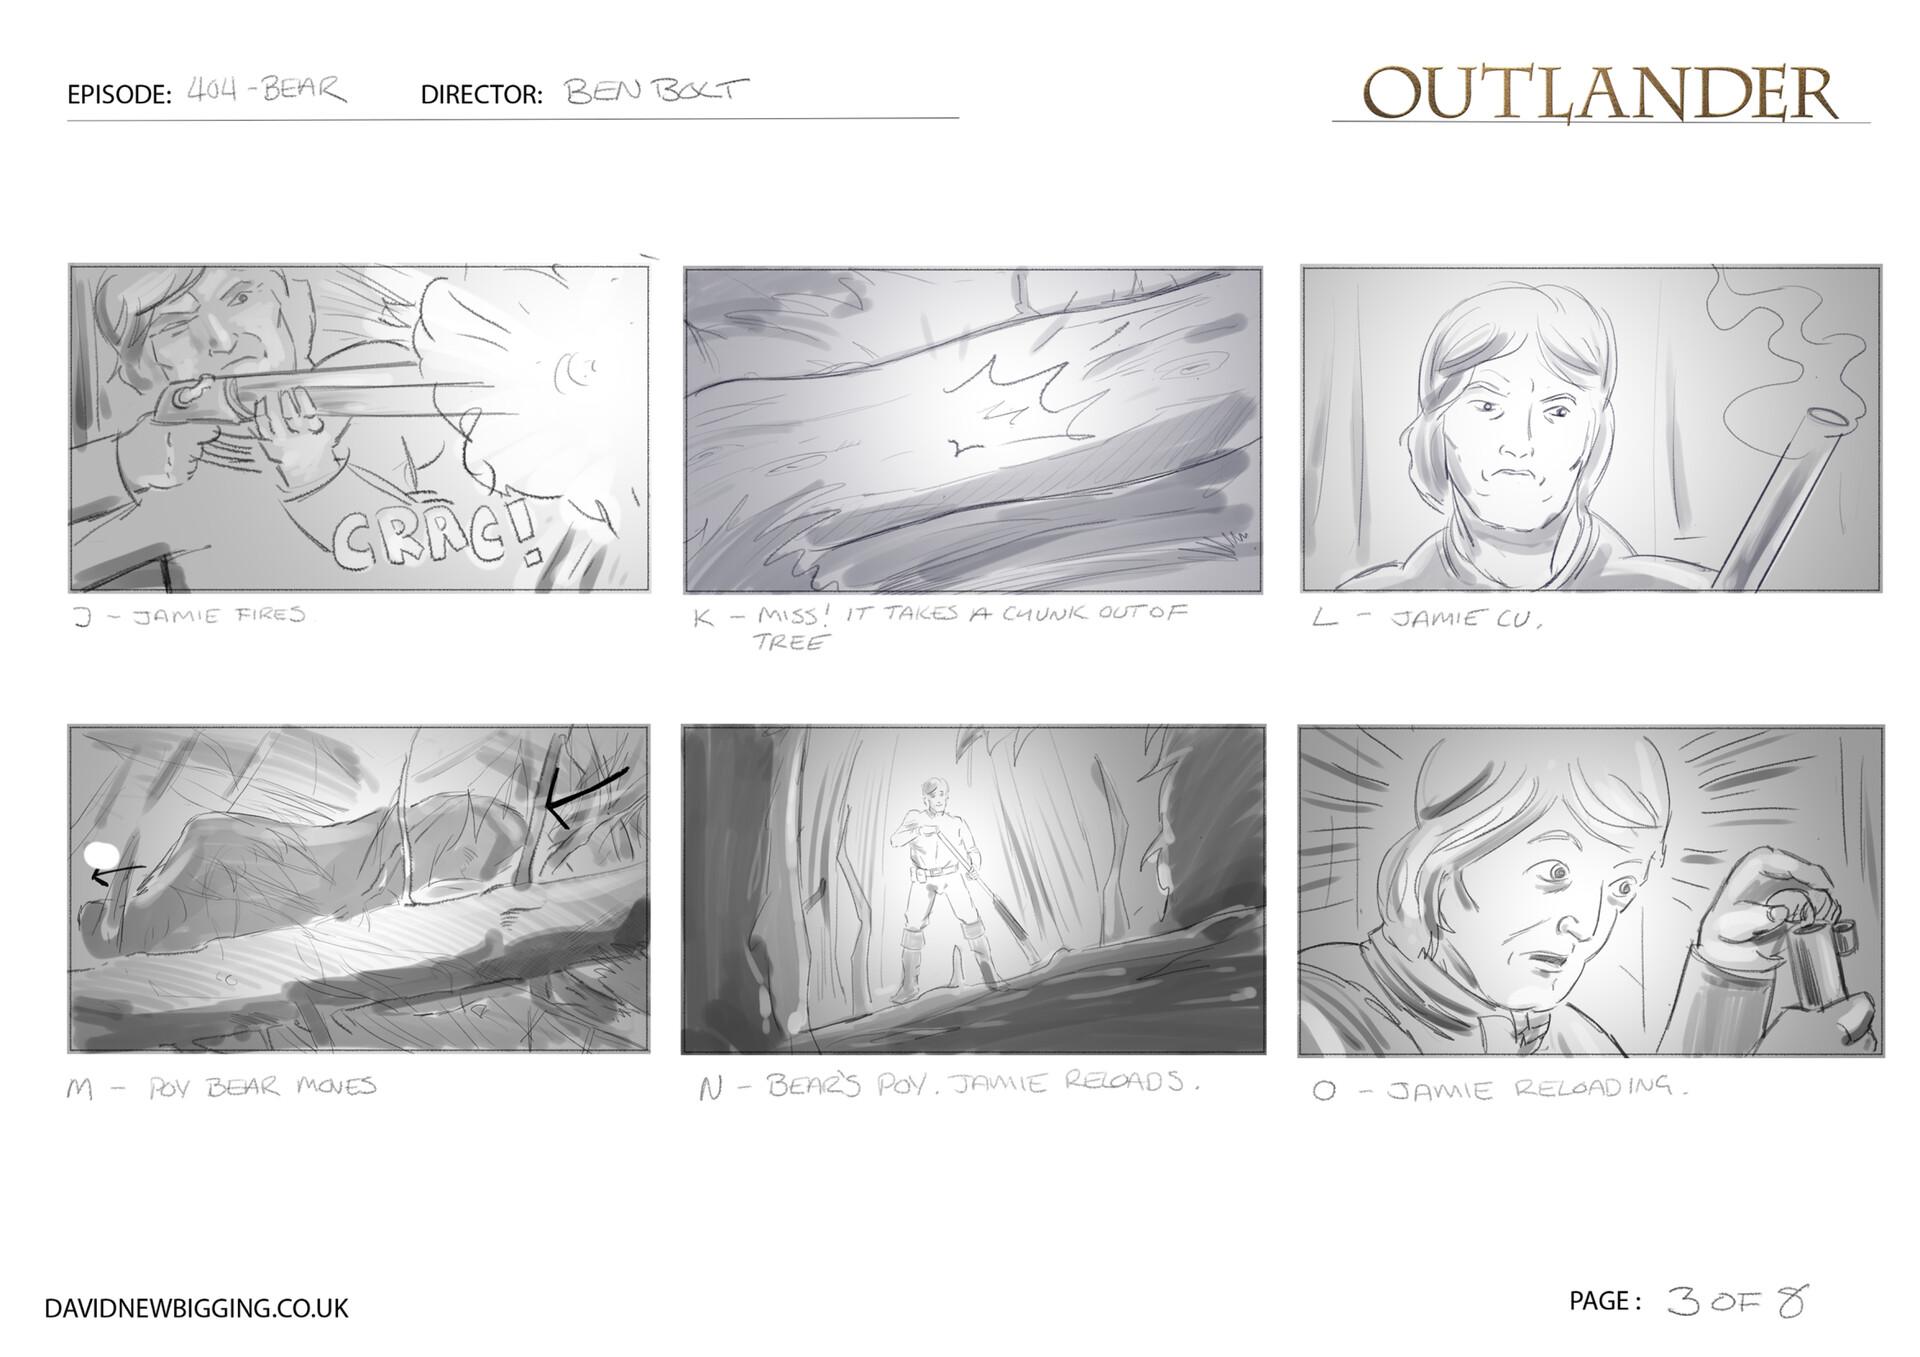 David newbigging outlander 404 bear sequence storyboards 3